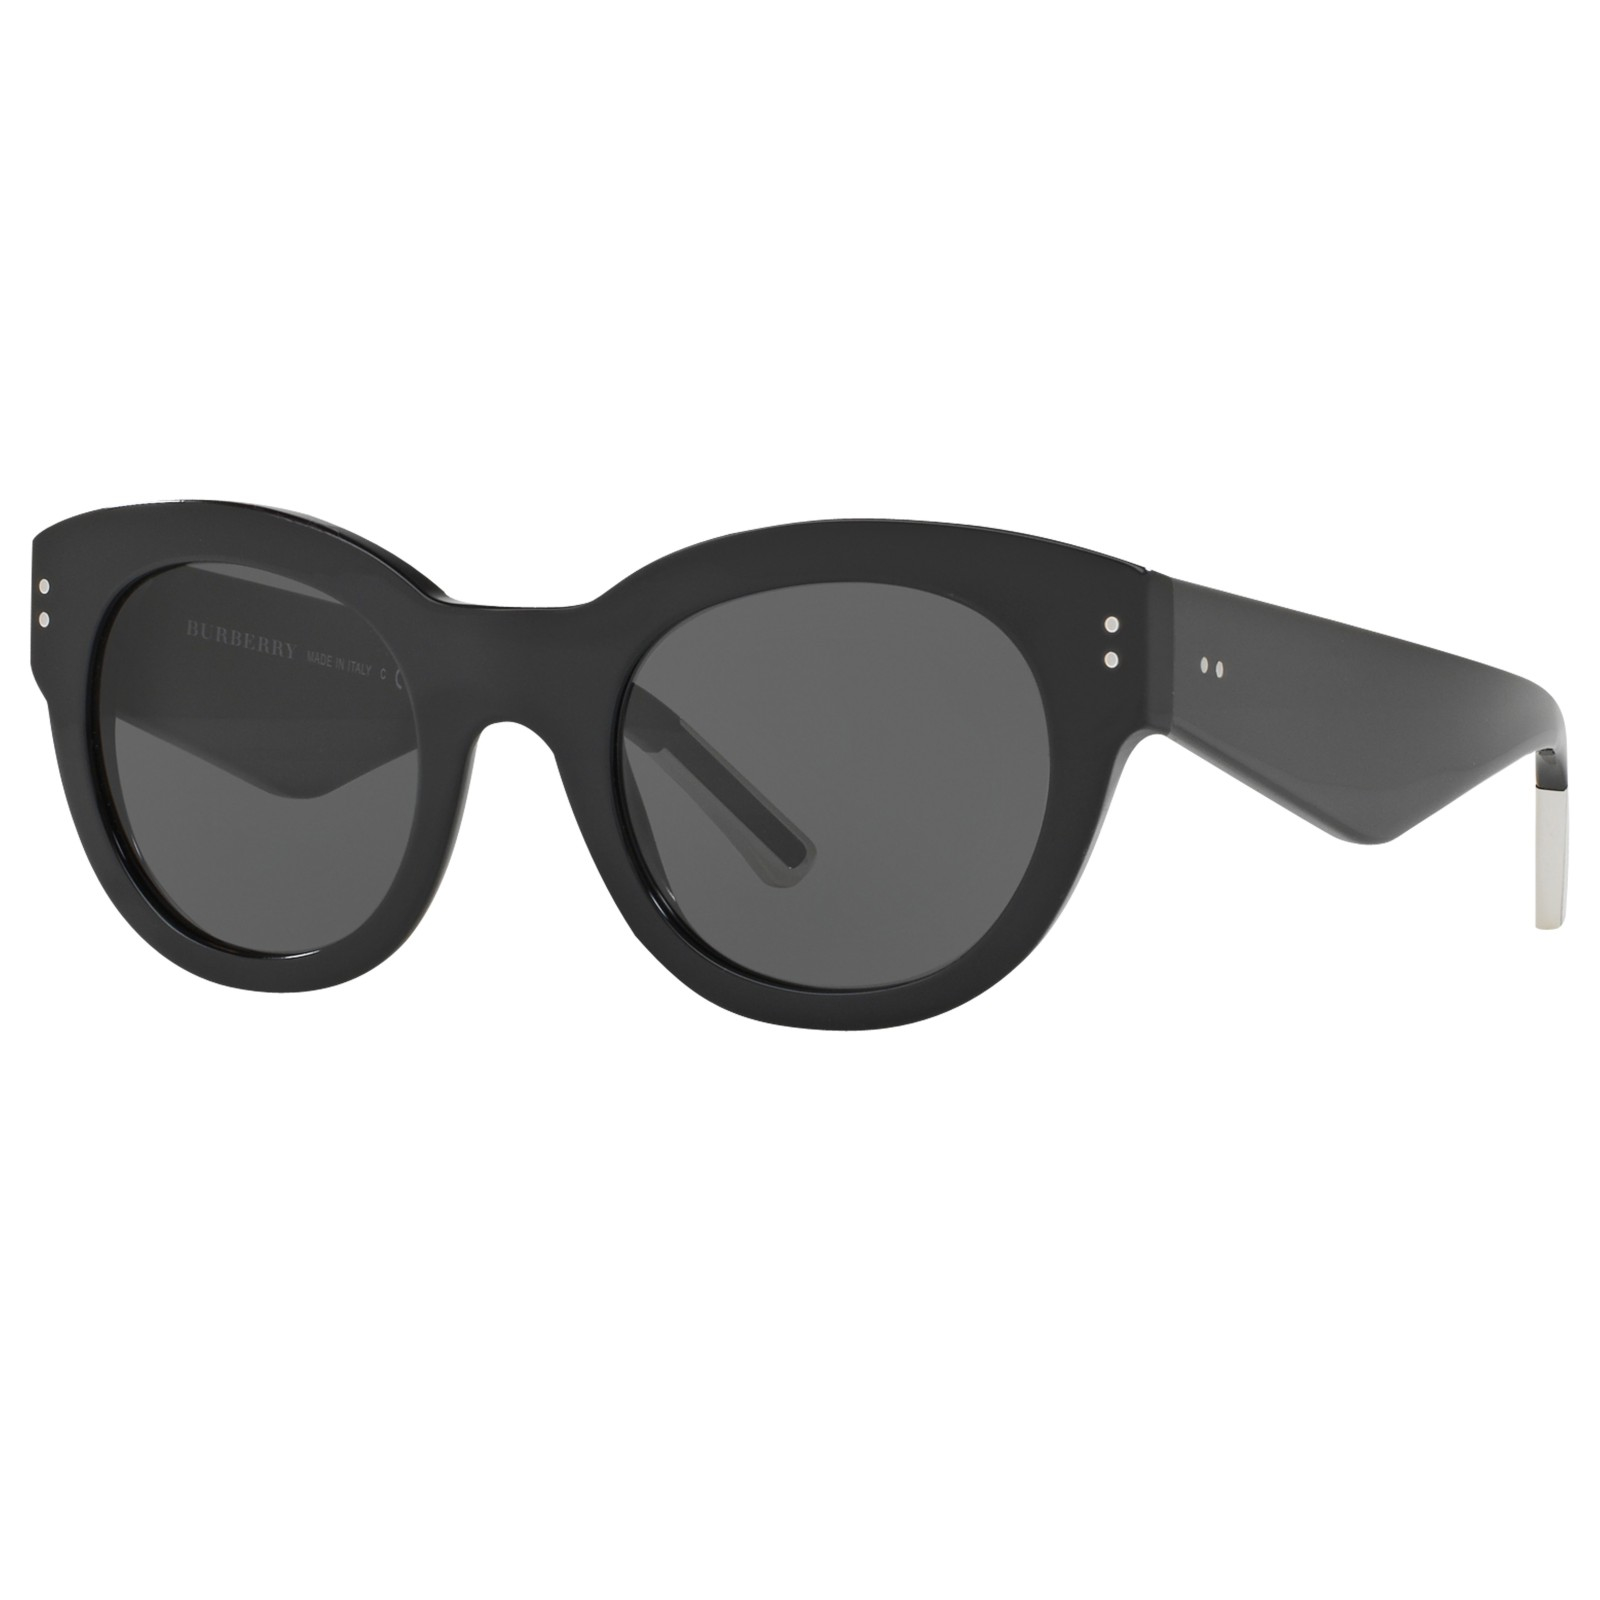 c2e8bc9b621 Burberry Sunglasses On Sale